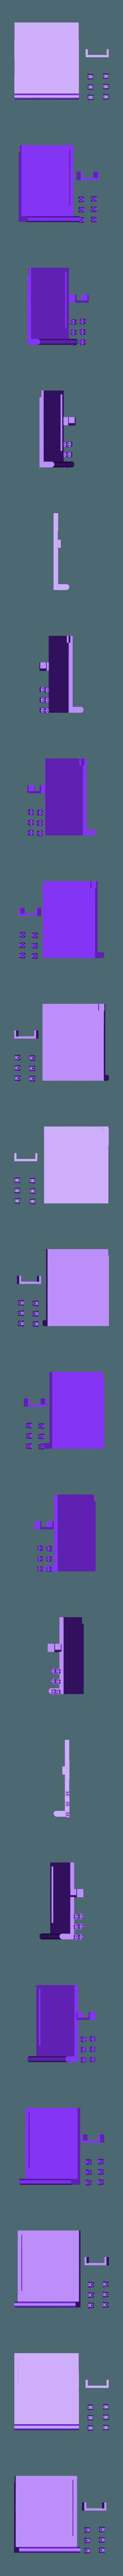 Mini presse Stratomaker 1.stl Download STL file Mini Press #STRATOMAKER • 3D printer design, Jojo_bricole